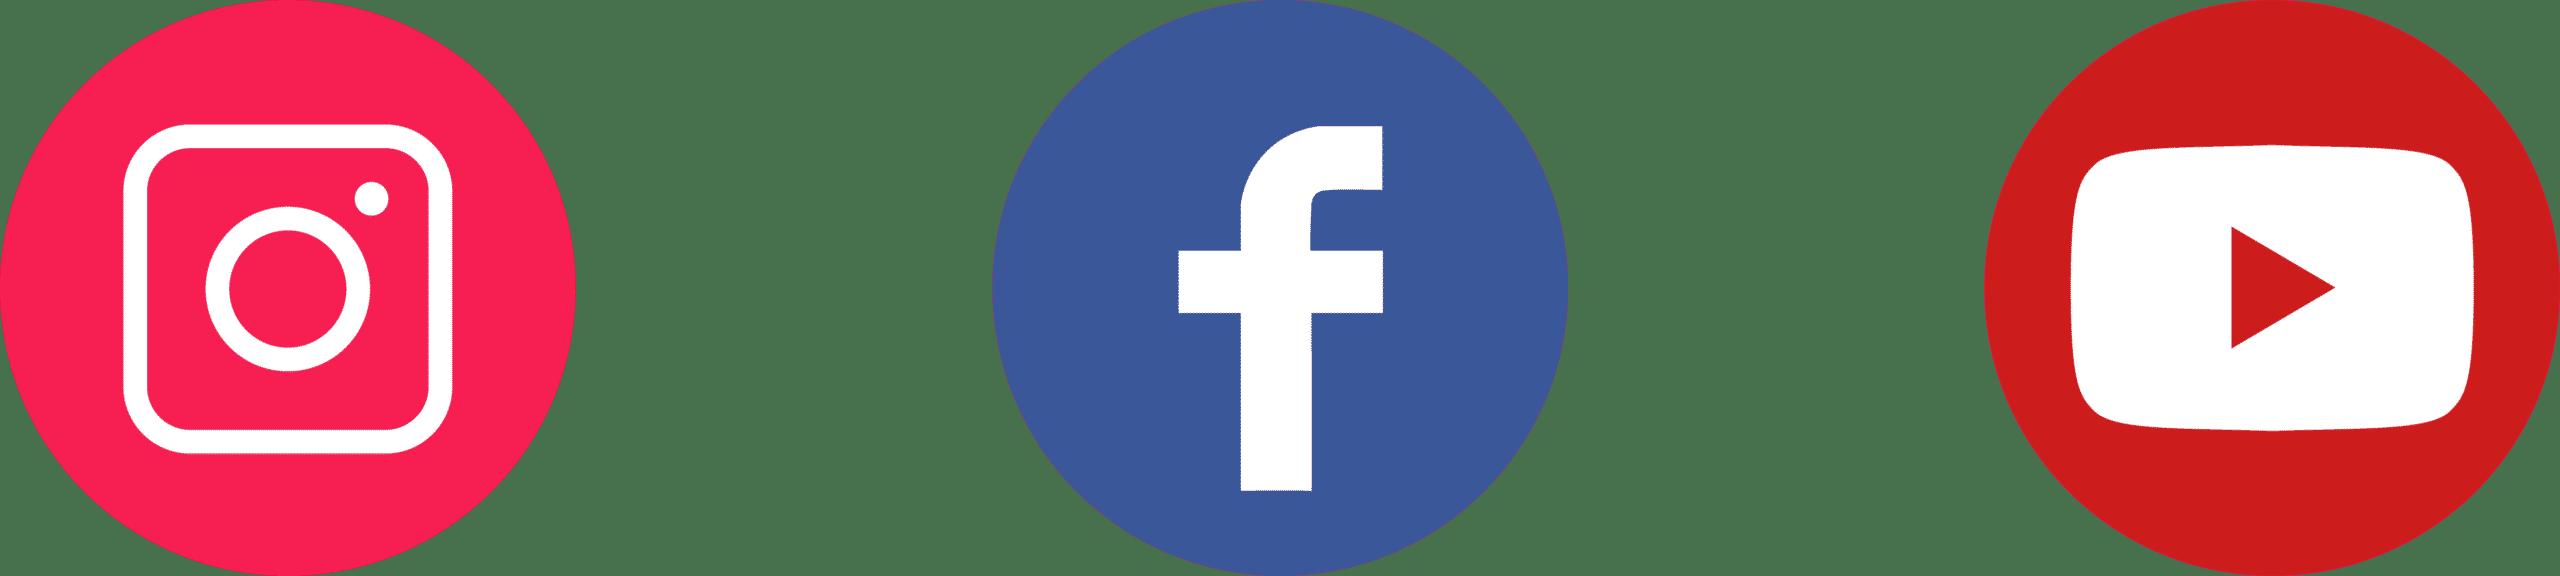 Social Media Logos Instagram Facebook Youtube Icons